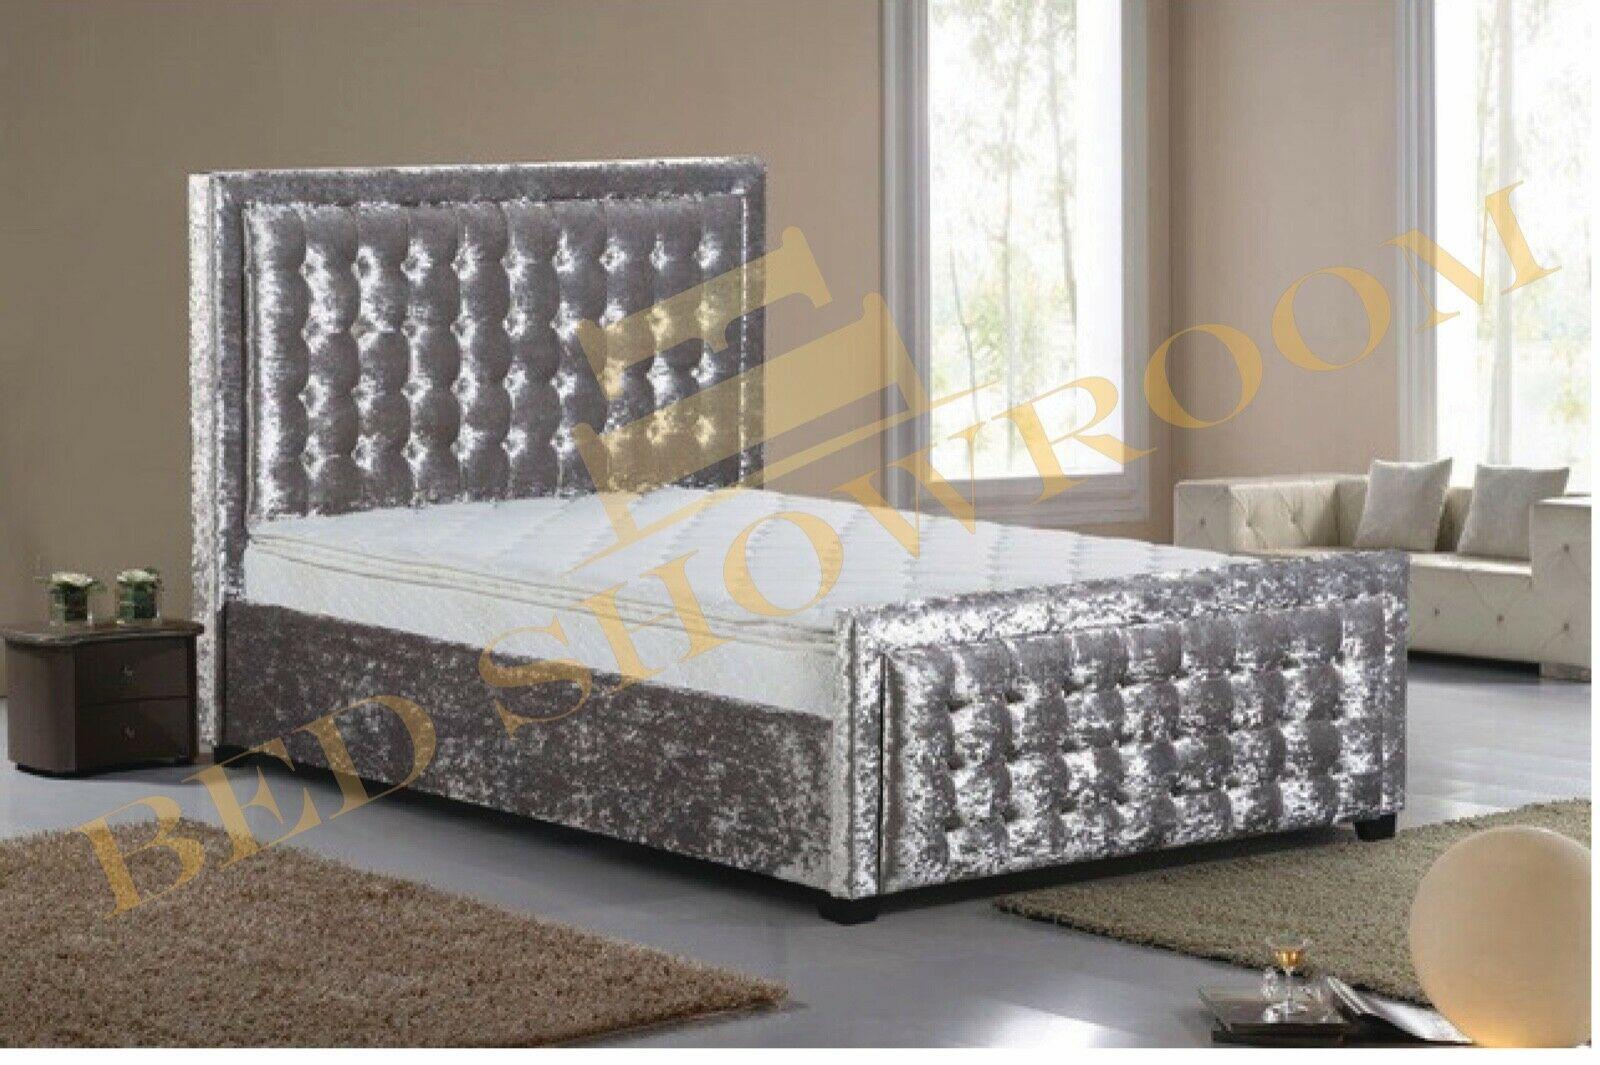 Home Furniture Diy All Sizes Sale Crushed Velvet Purple Upholstered Diamond Bed Frame 3ft 4ft6 5ft Kisetsu System Co Jp